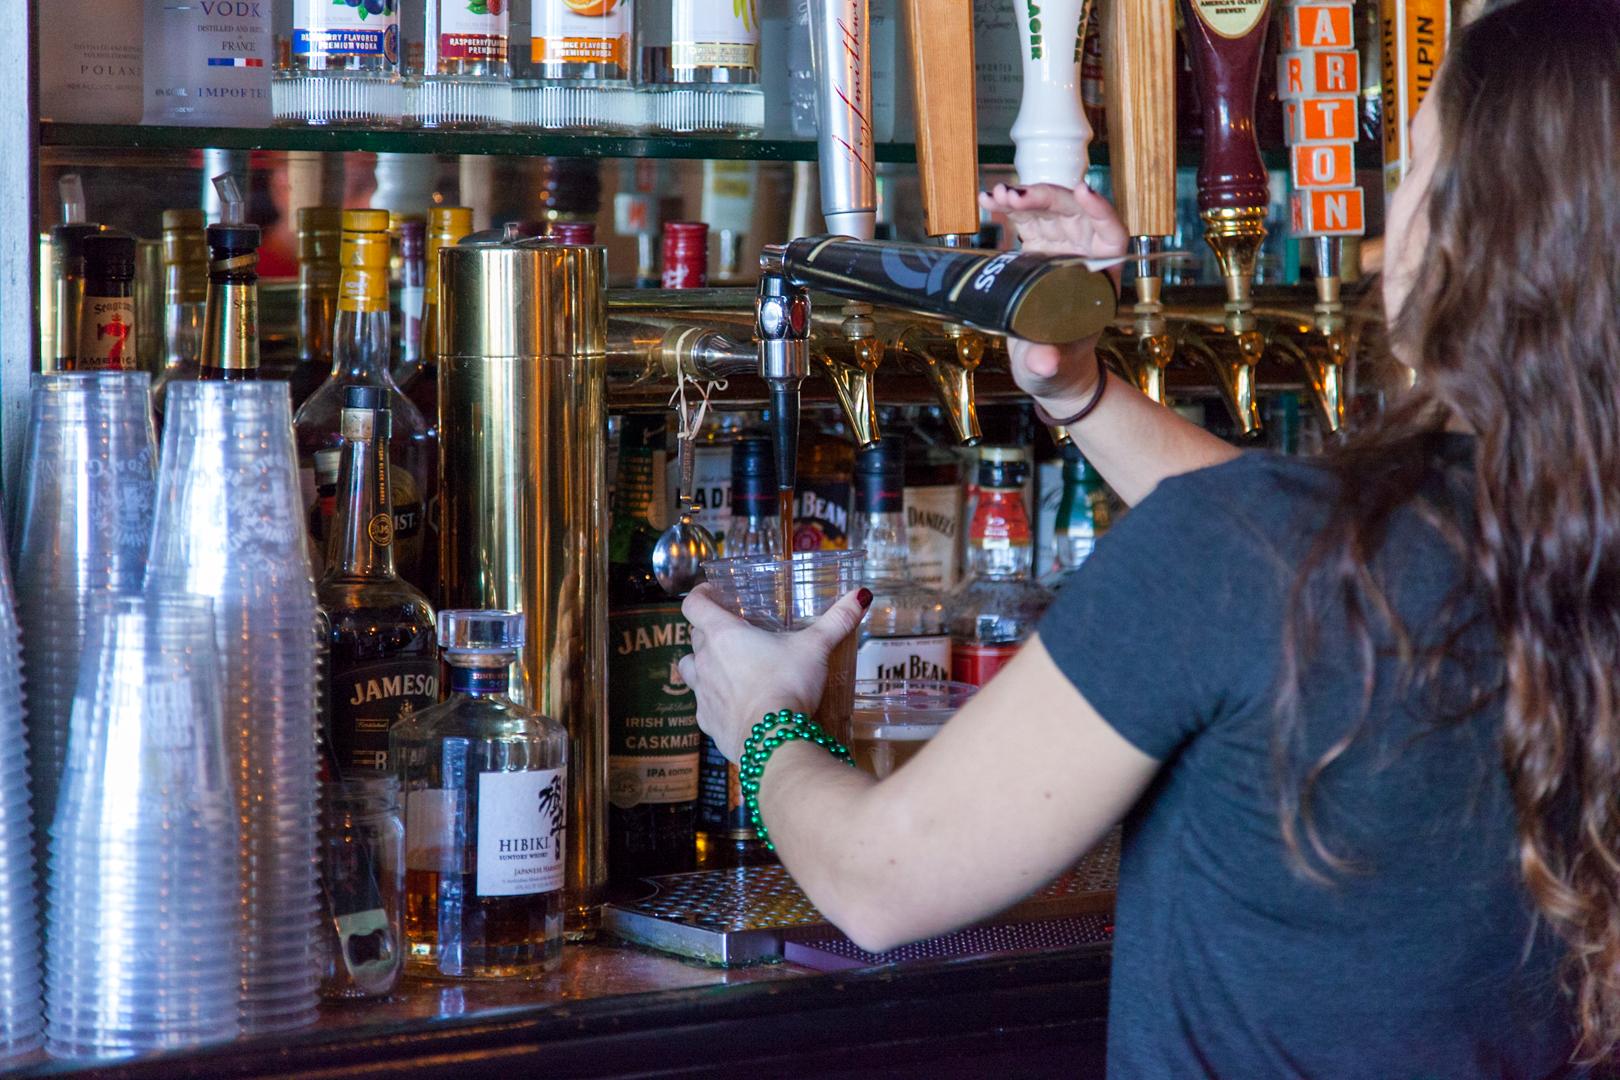 Sheelen's Crossing Pub, Fanwood NJ